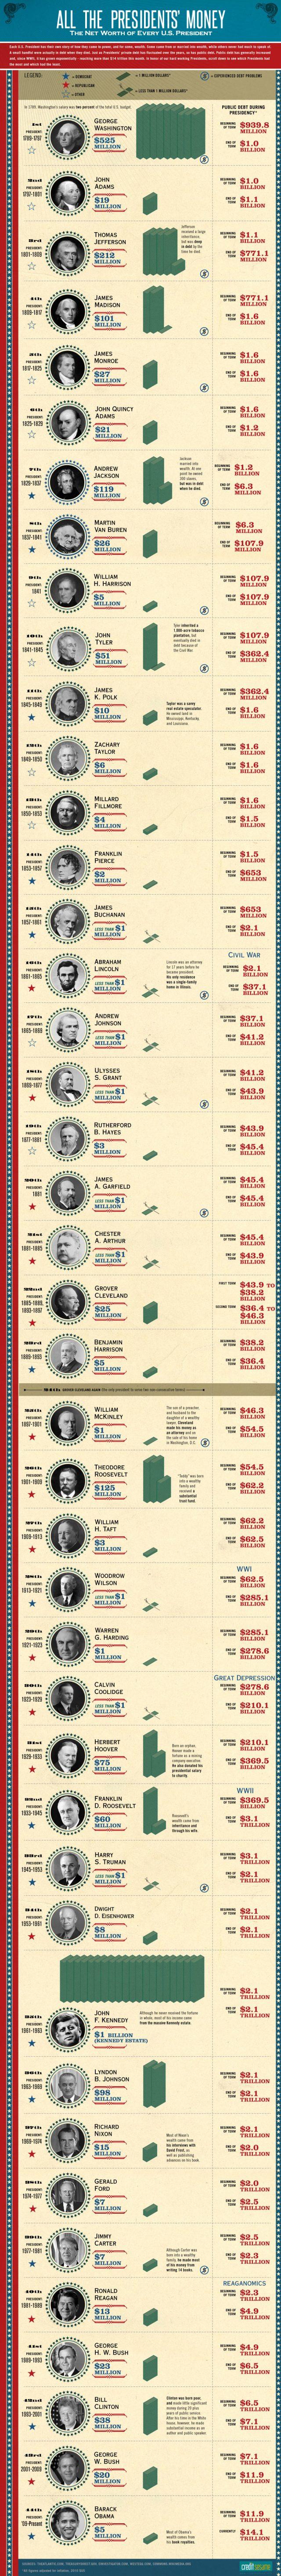 Net Worth of American Presidents